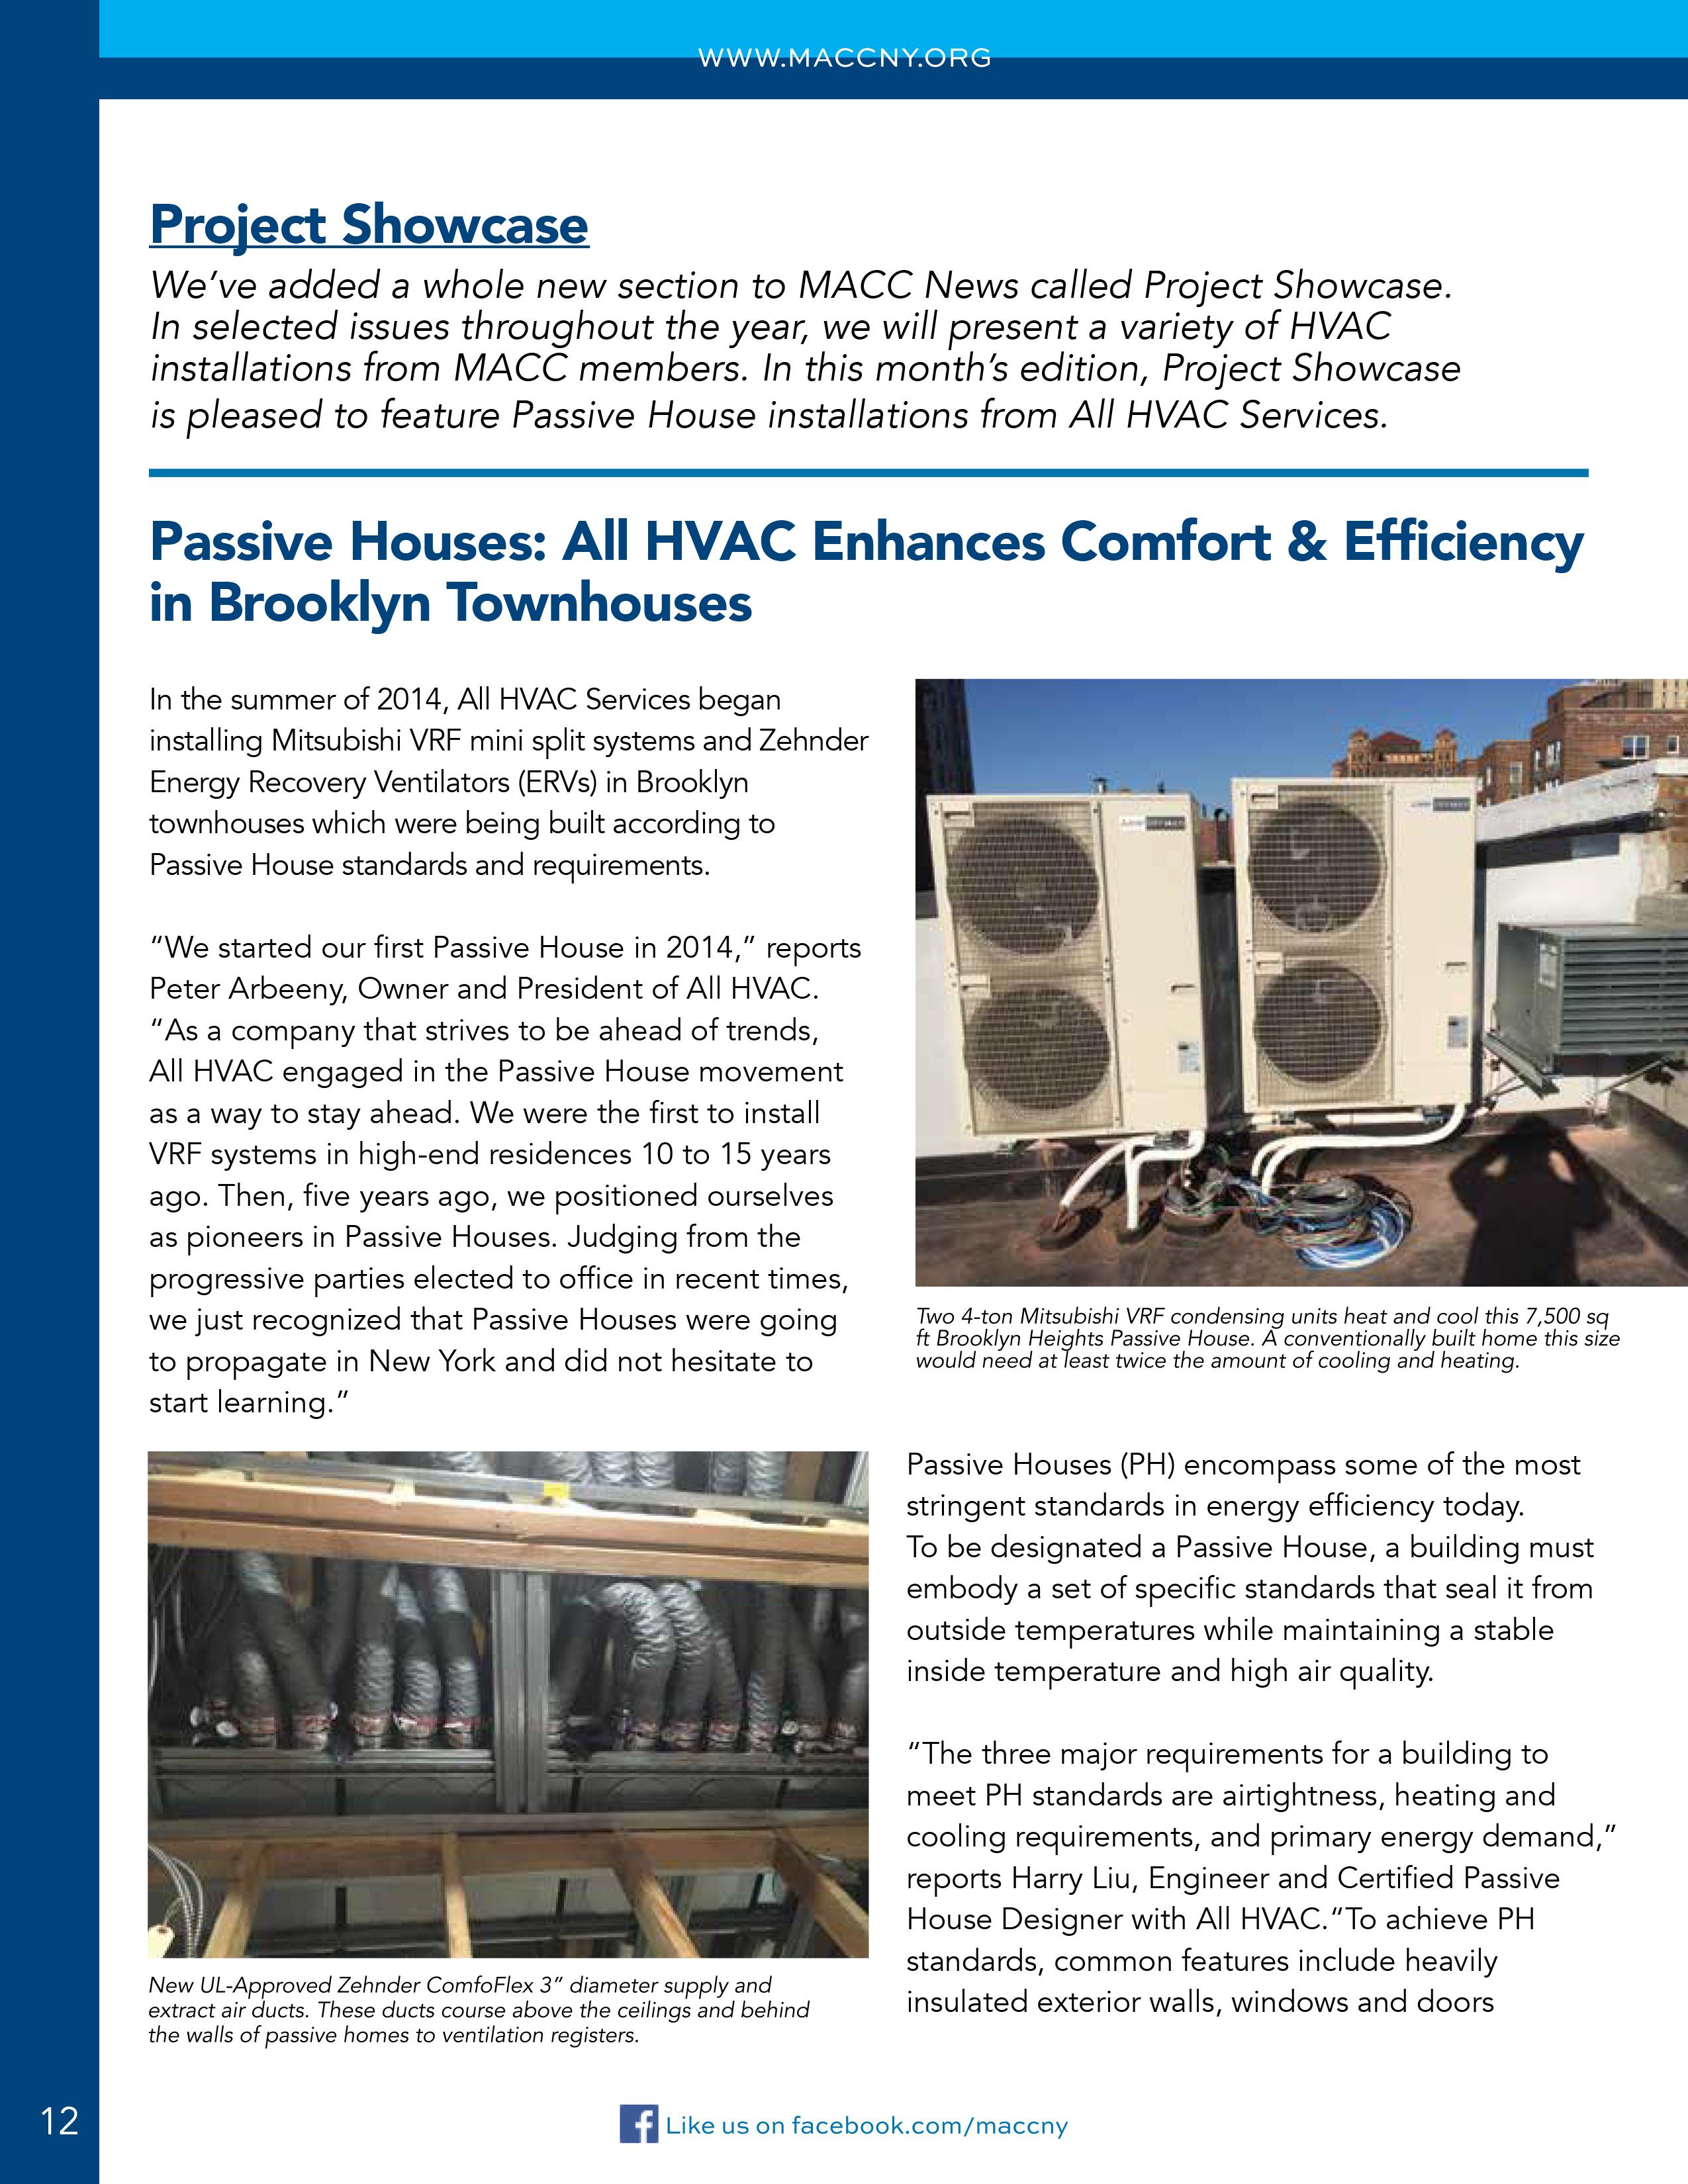 MACC News: Project Showcase: Passive Houses: All HVAC